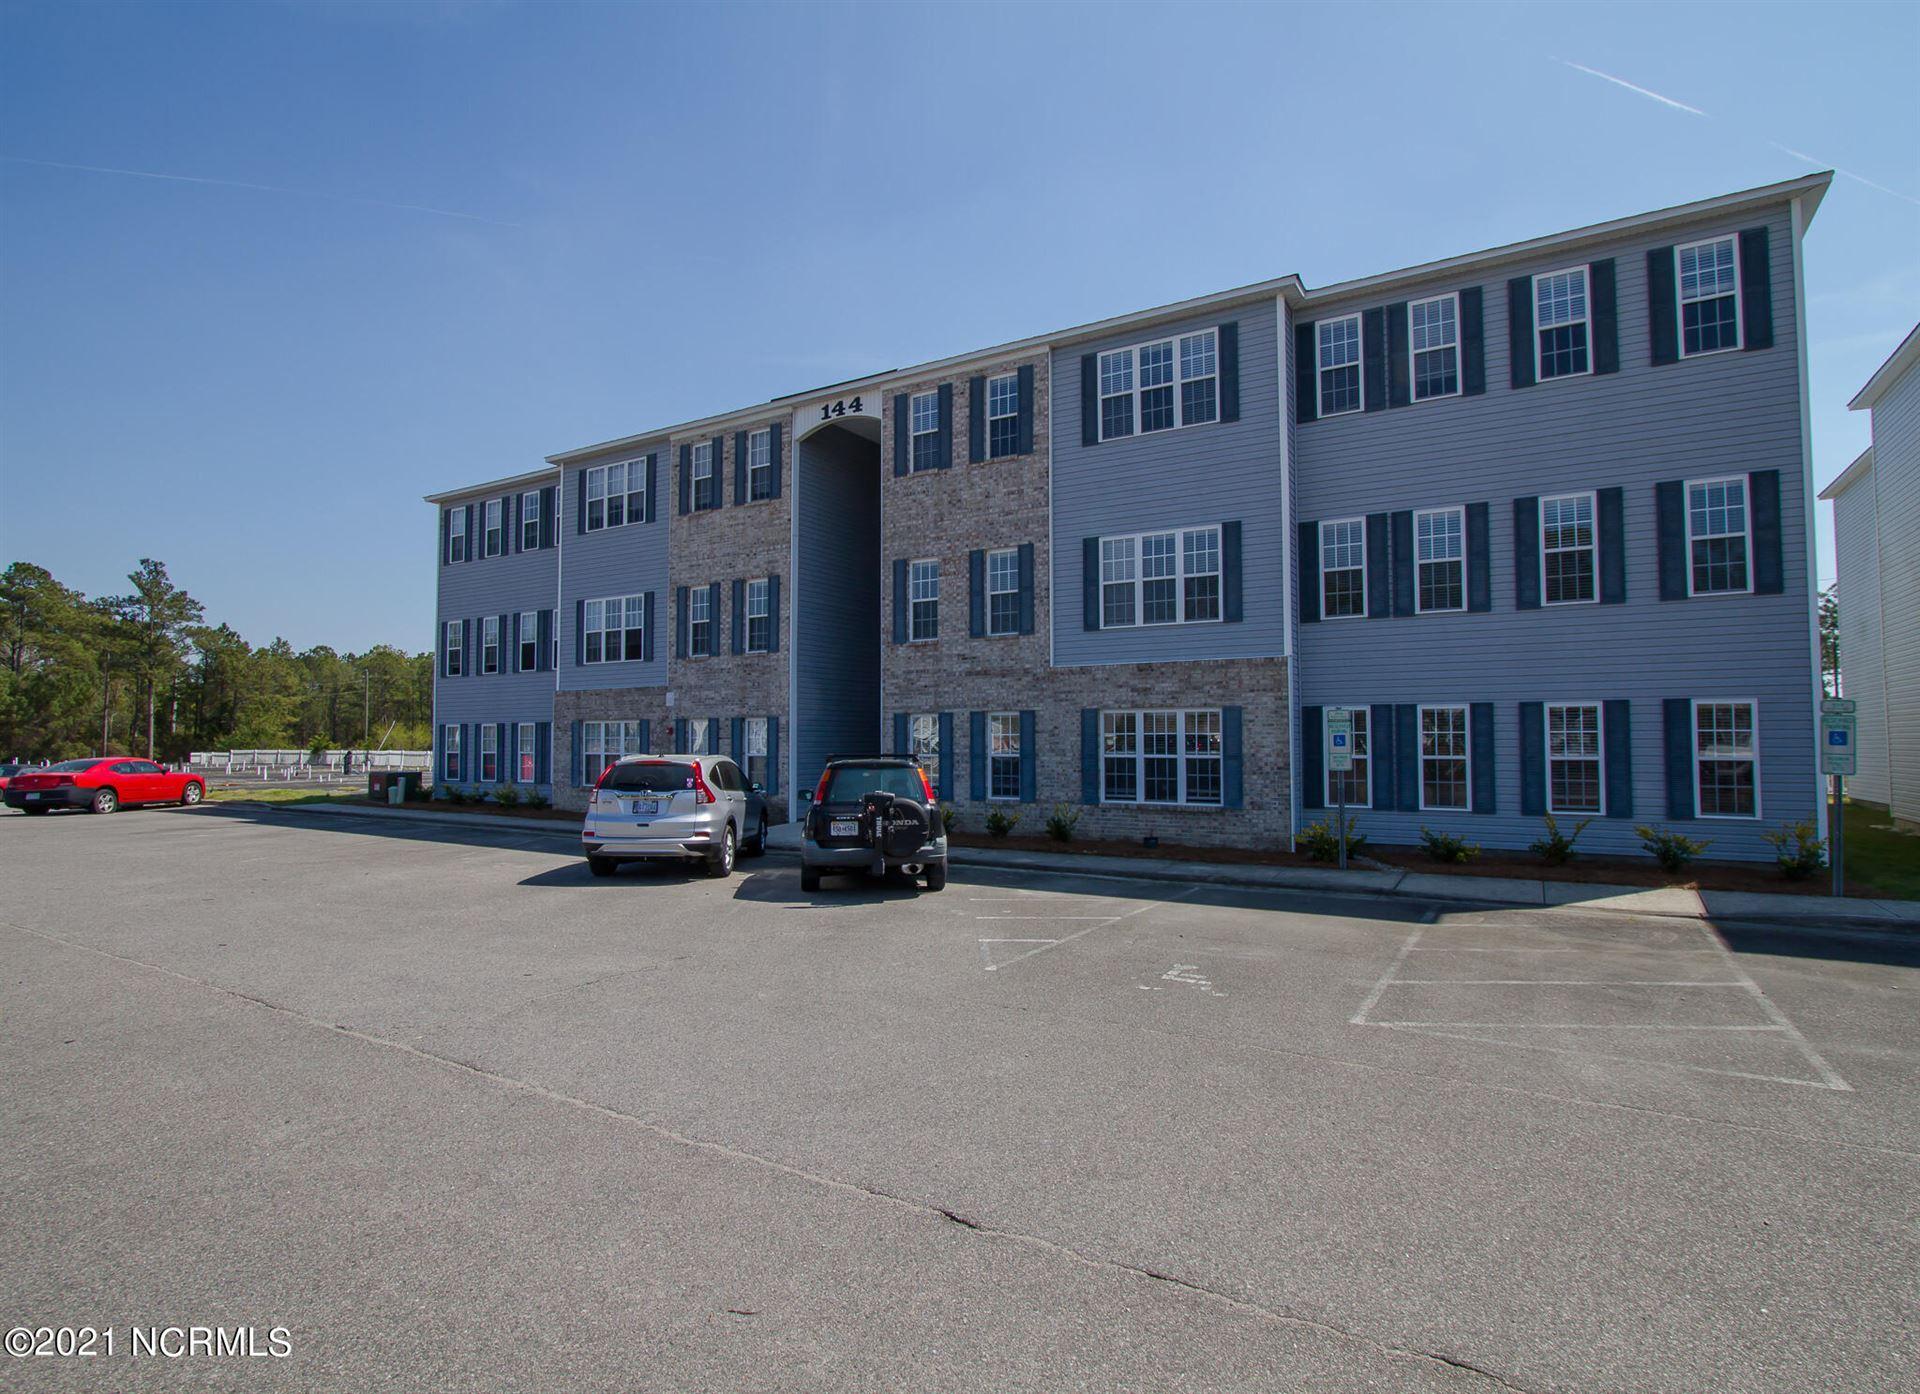 Photo of 144 N Hines Street #F, Holly Ridge, NC 28445 (MLS # 100263566)